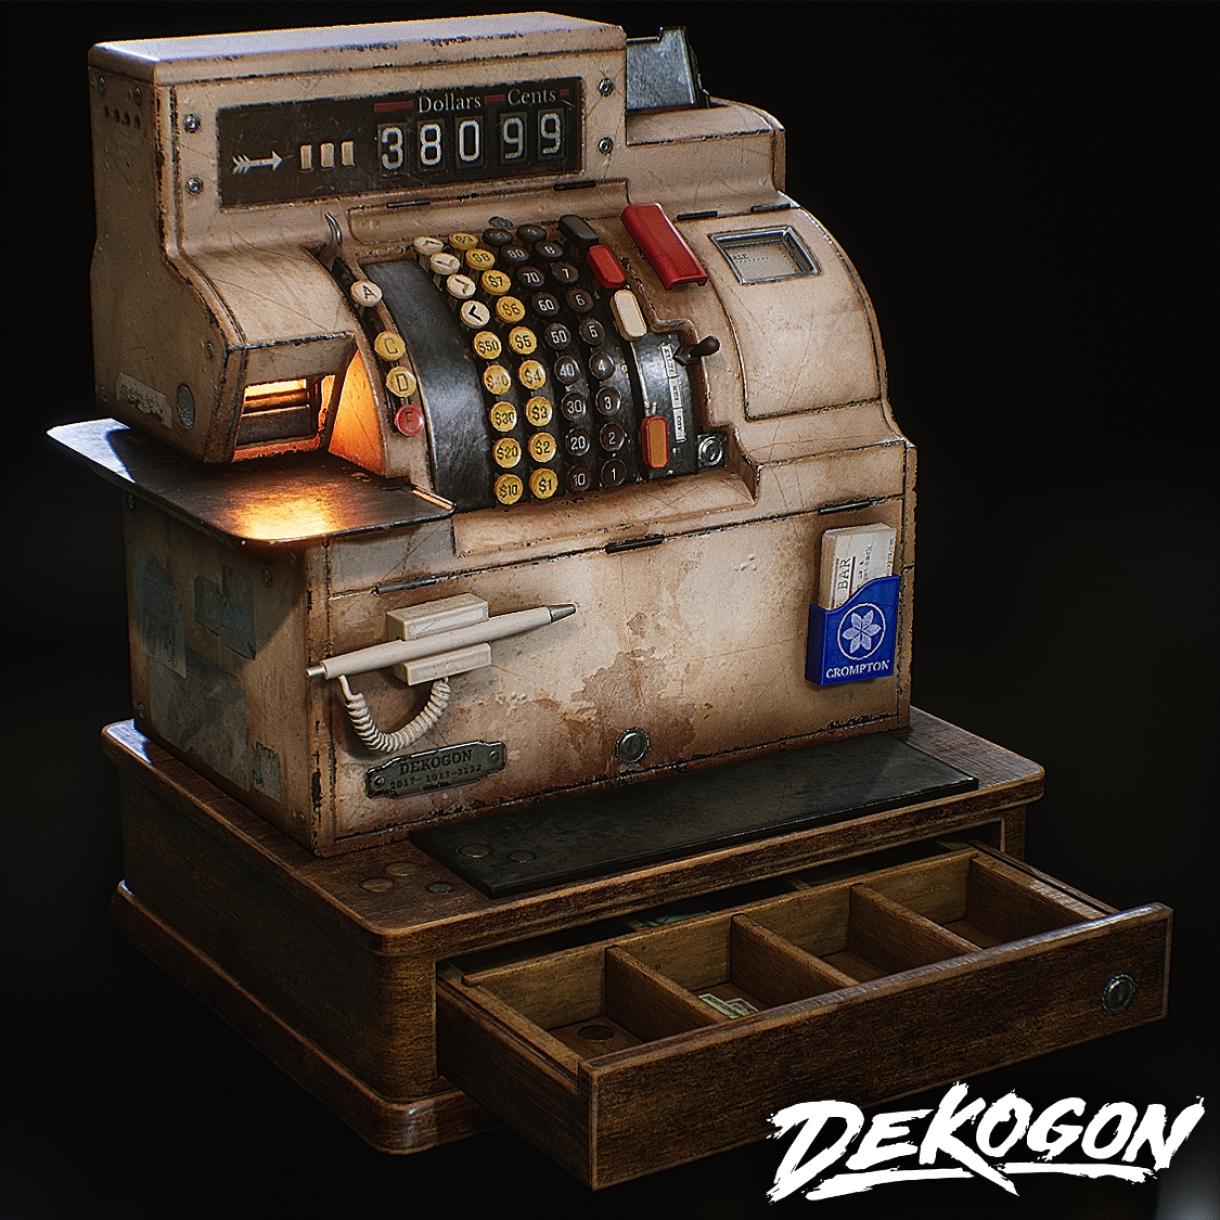 Dekogon Studios: Building Assets for Sale